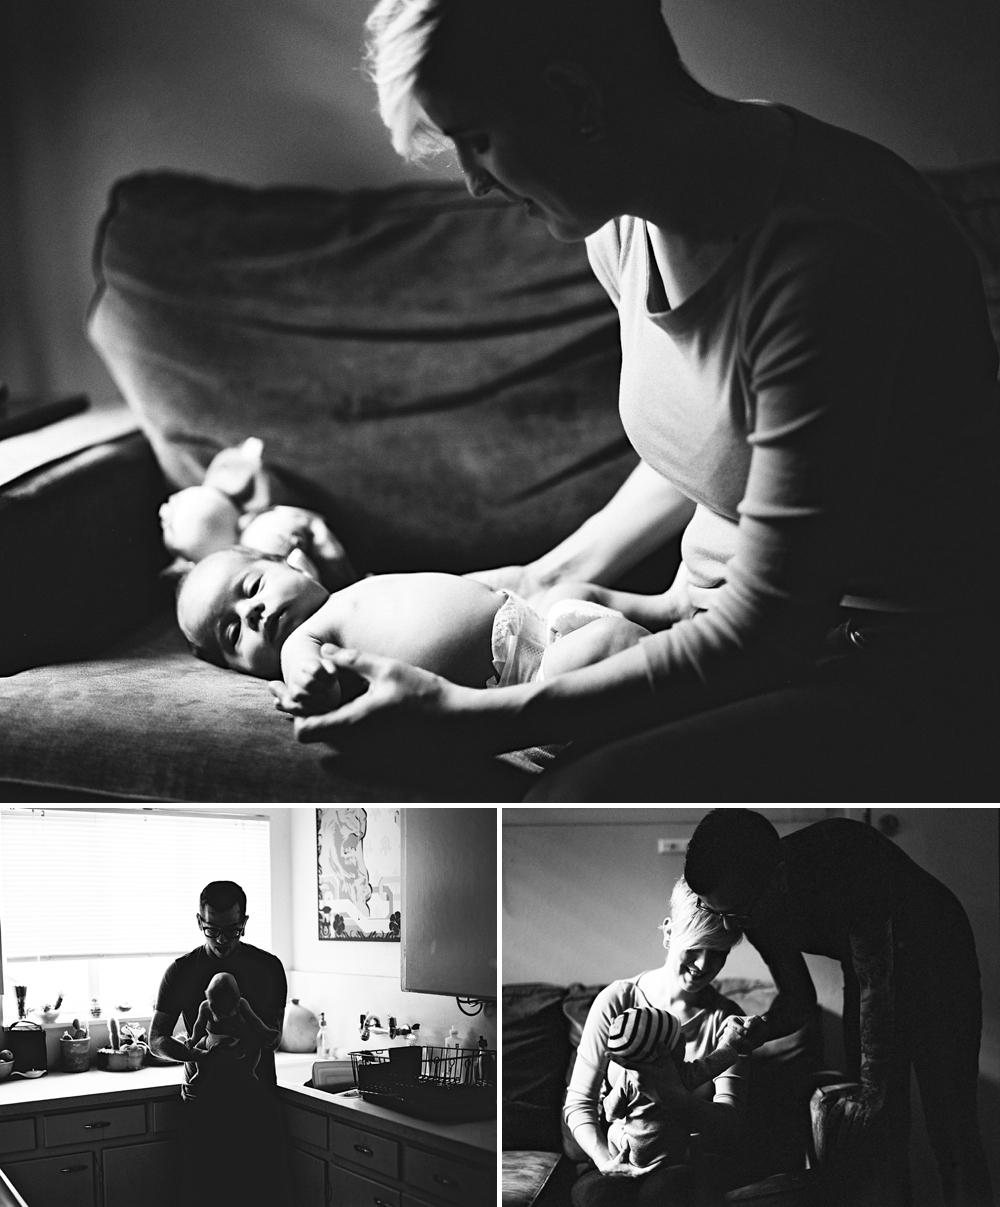 dallas family portraits_0004.jpg